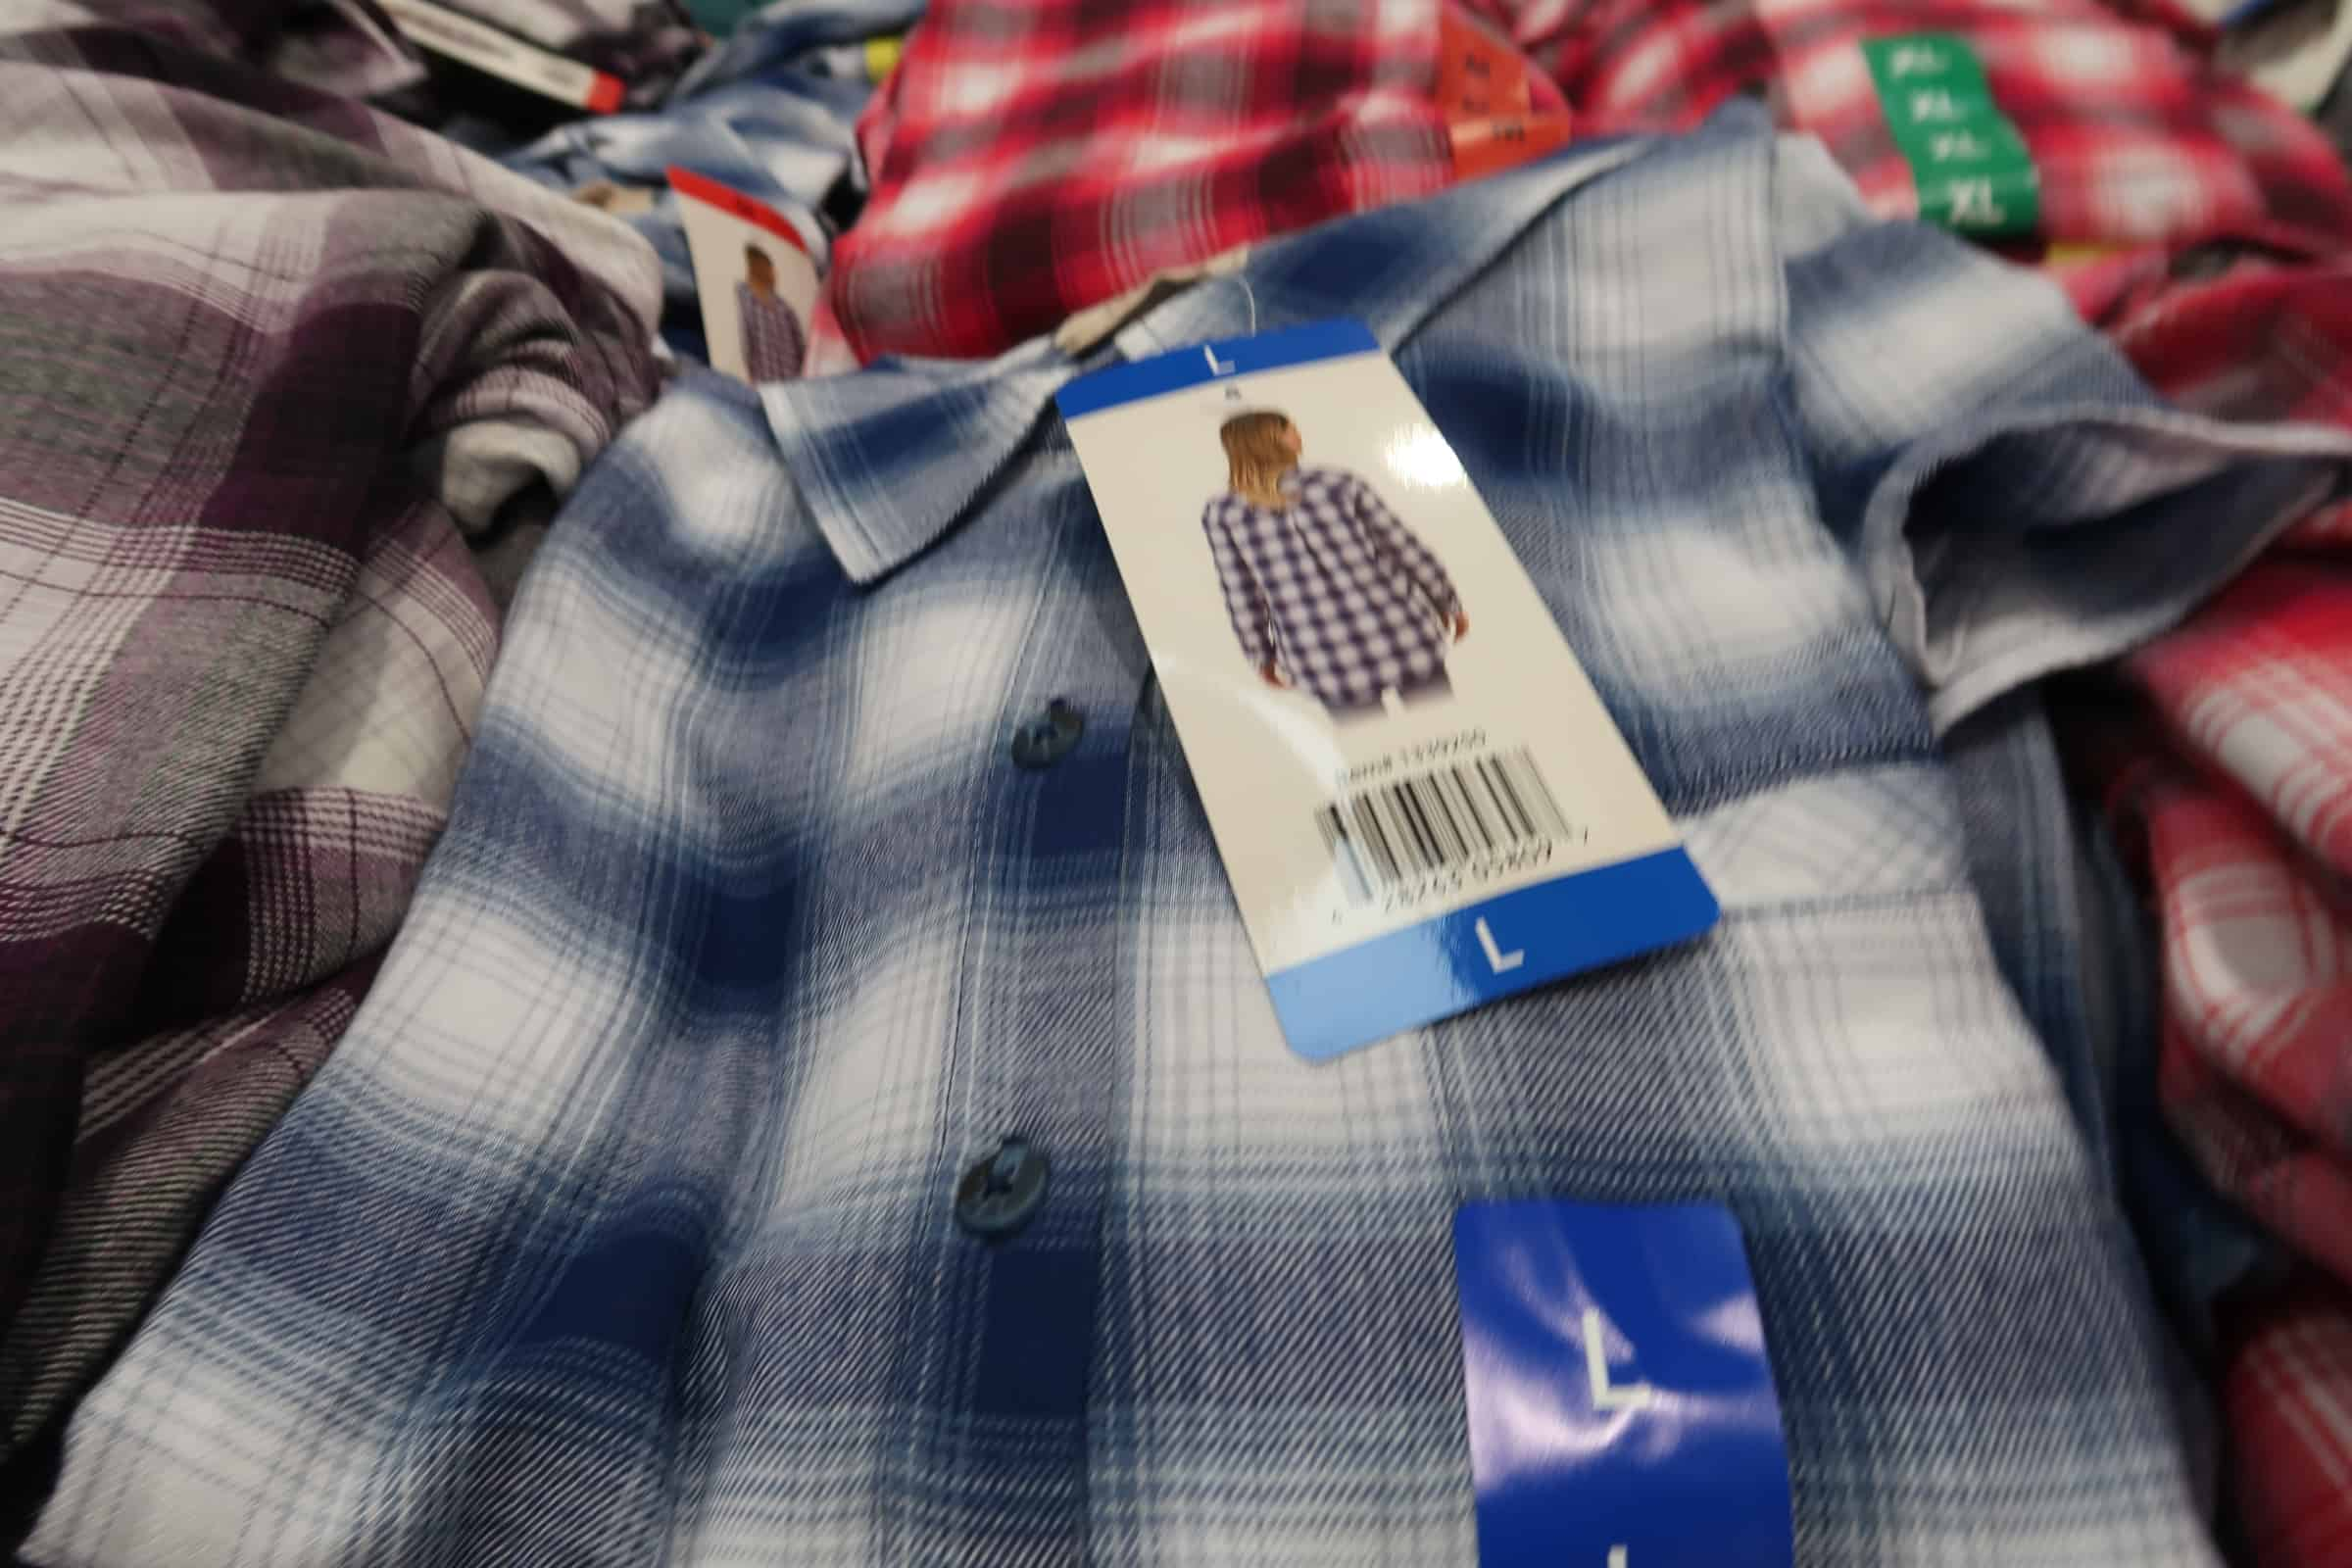 Ladies Flannel Tunics $12.99 at Costco